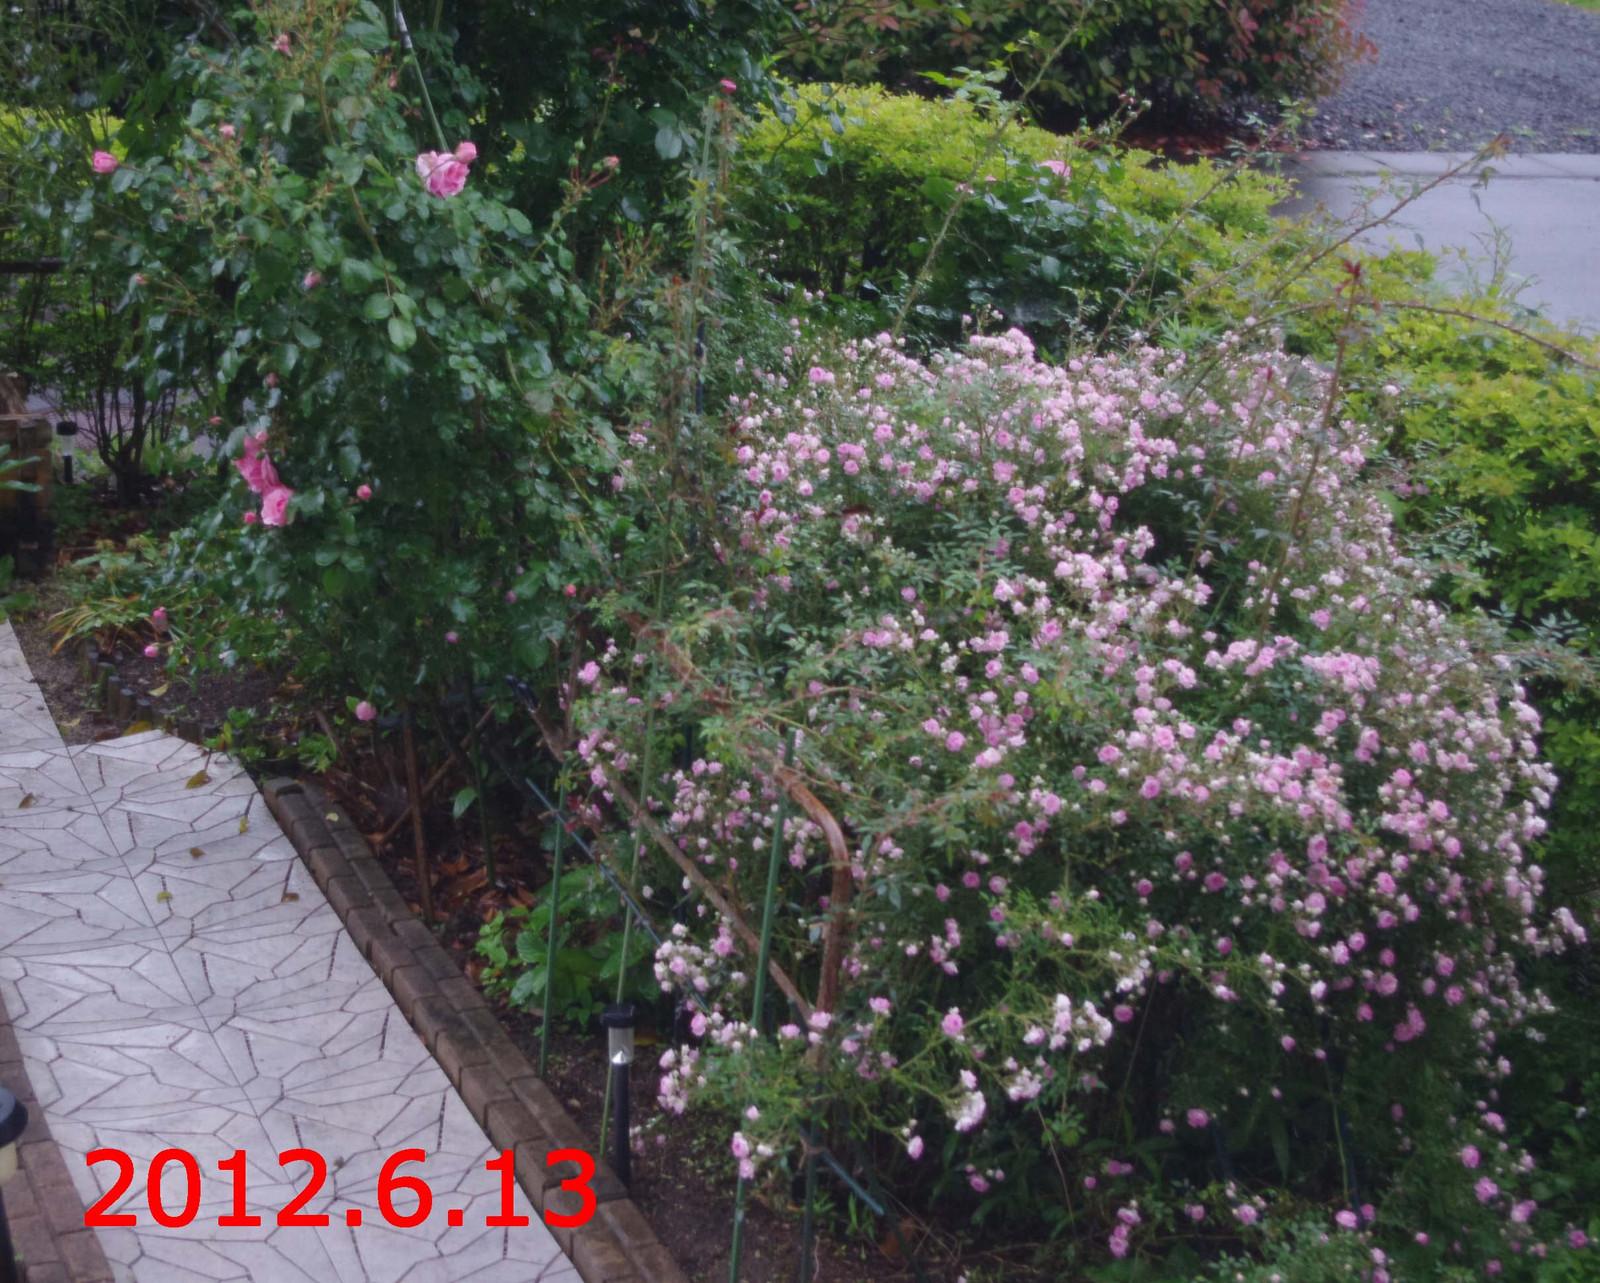 2012_06_13_5353_edited1